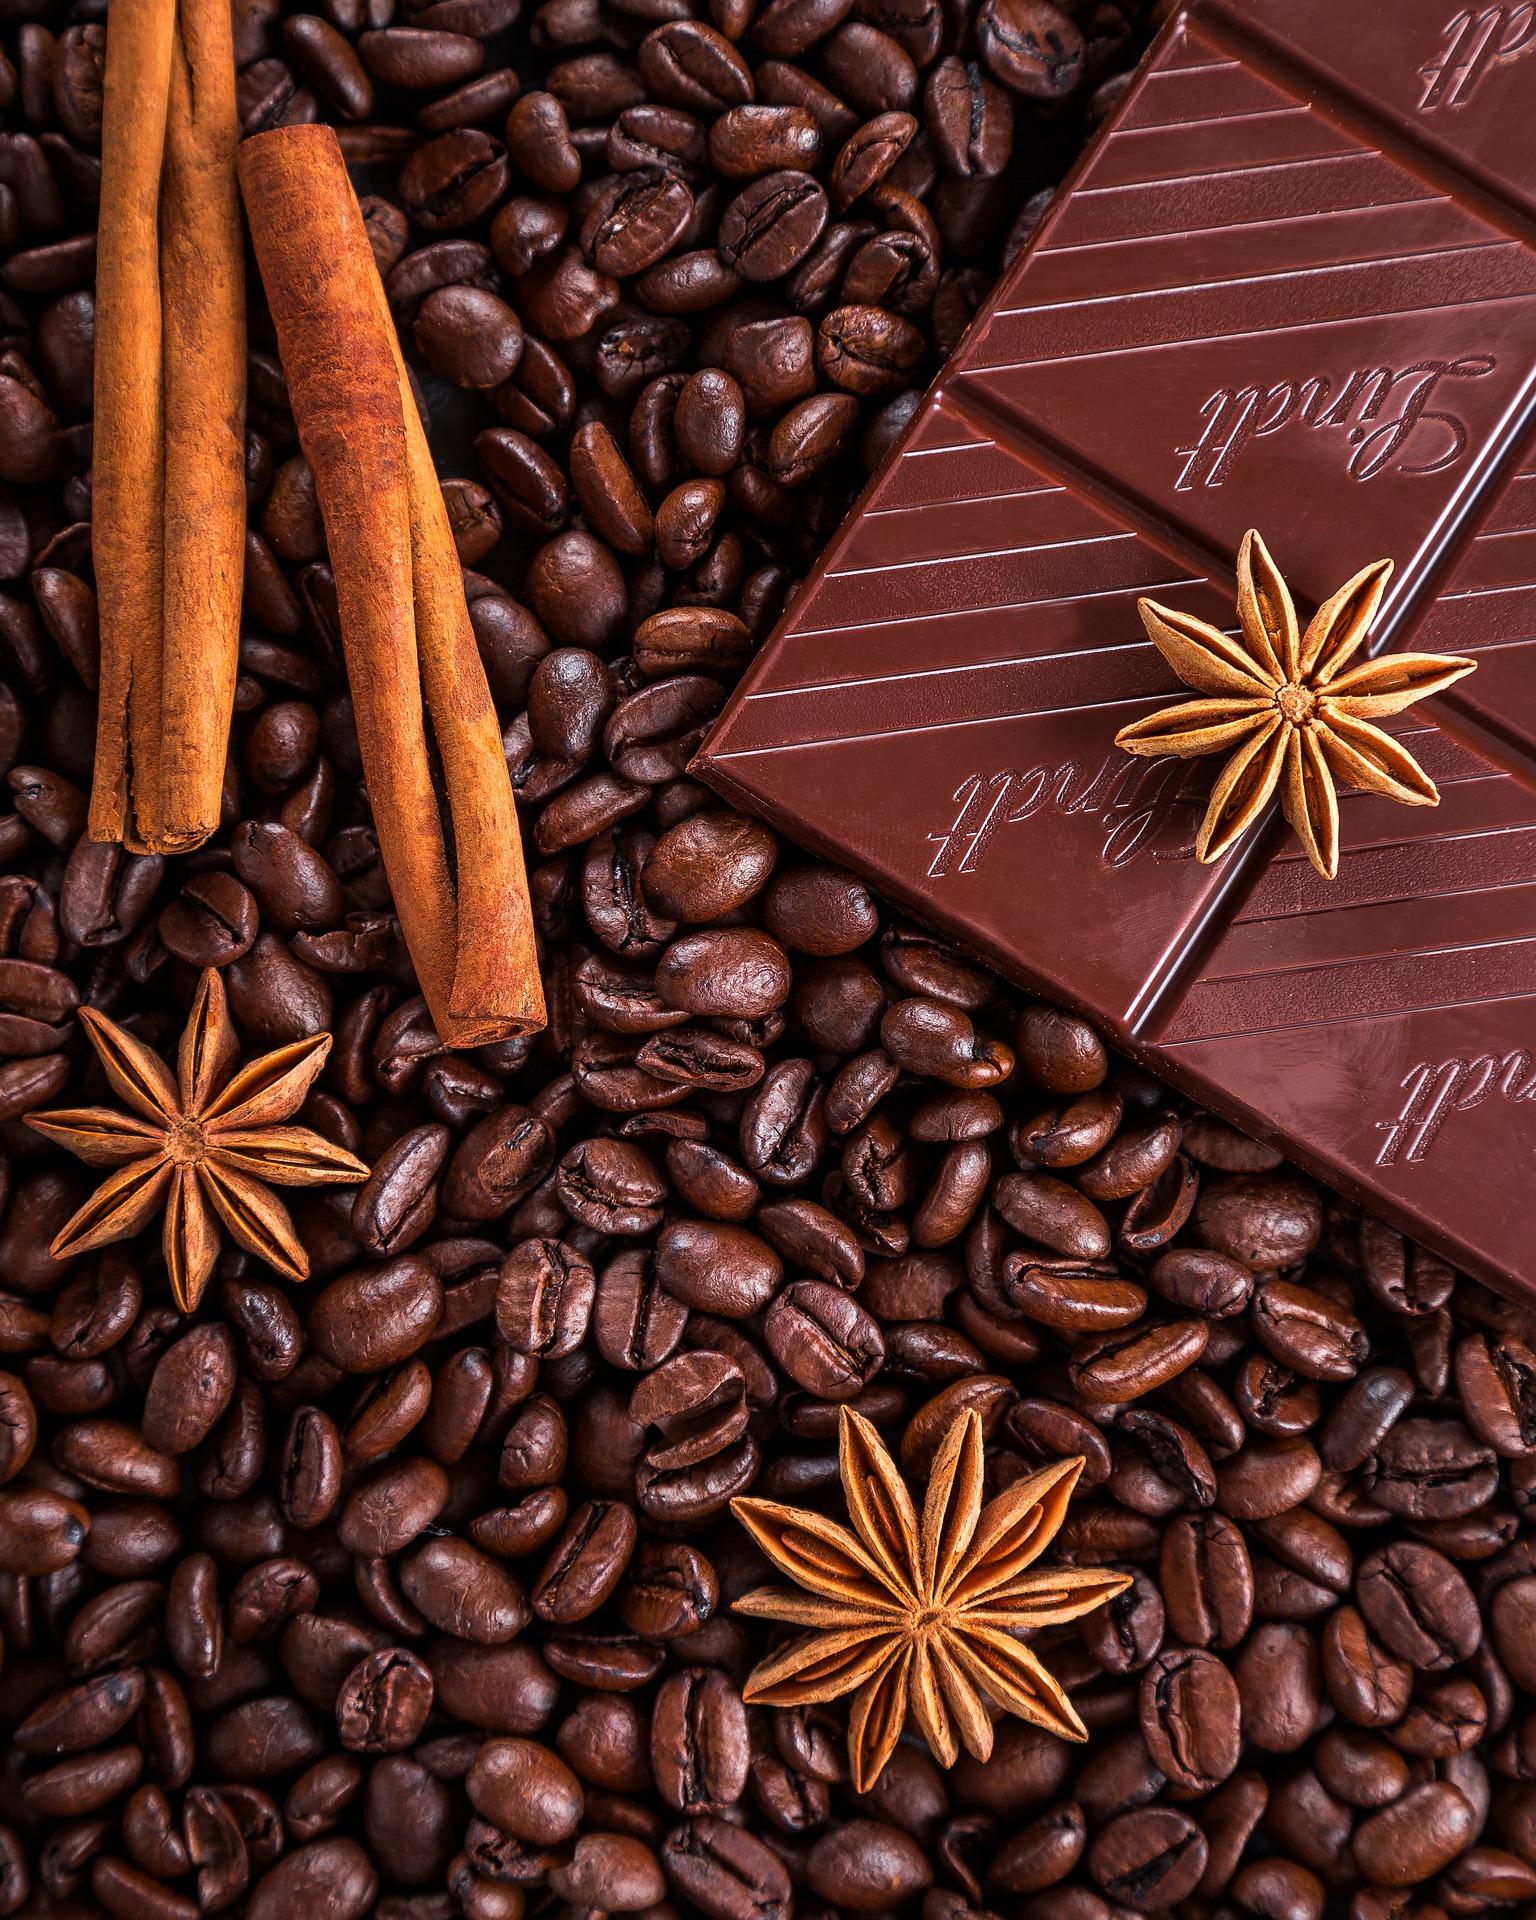 Coffee Beans and Chocolate, Bean, Choc, Chocolate, Coffee, HQ Photo